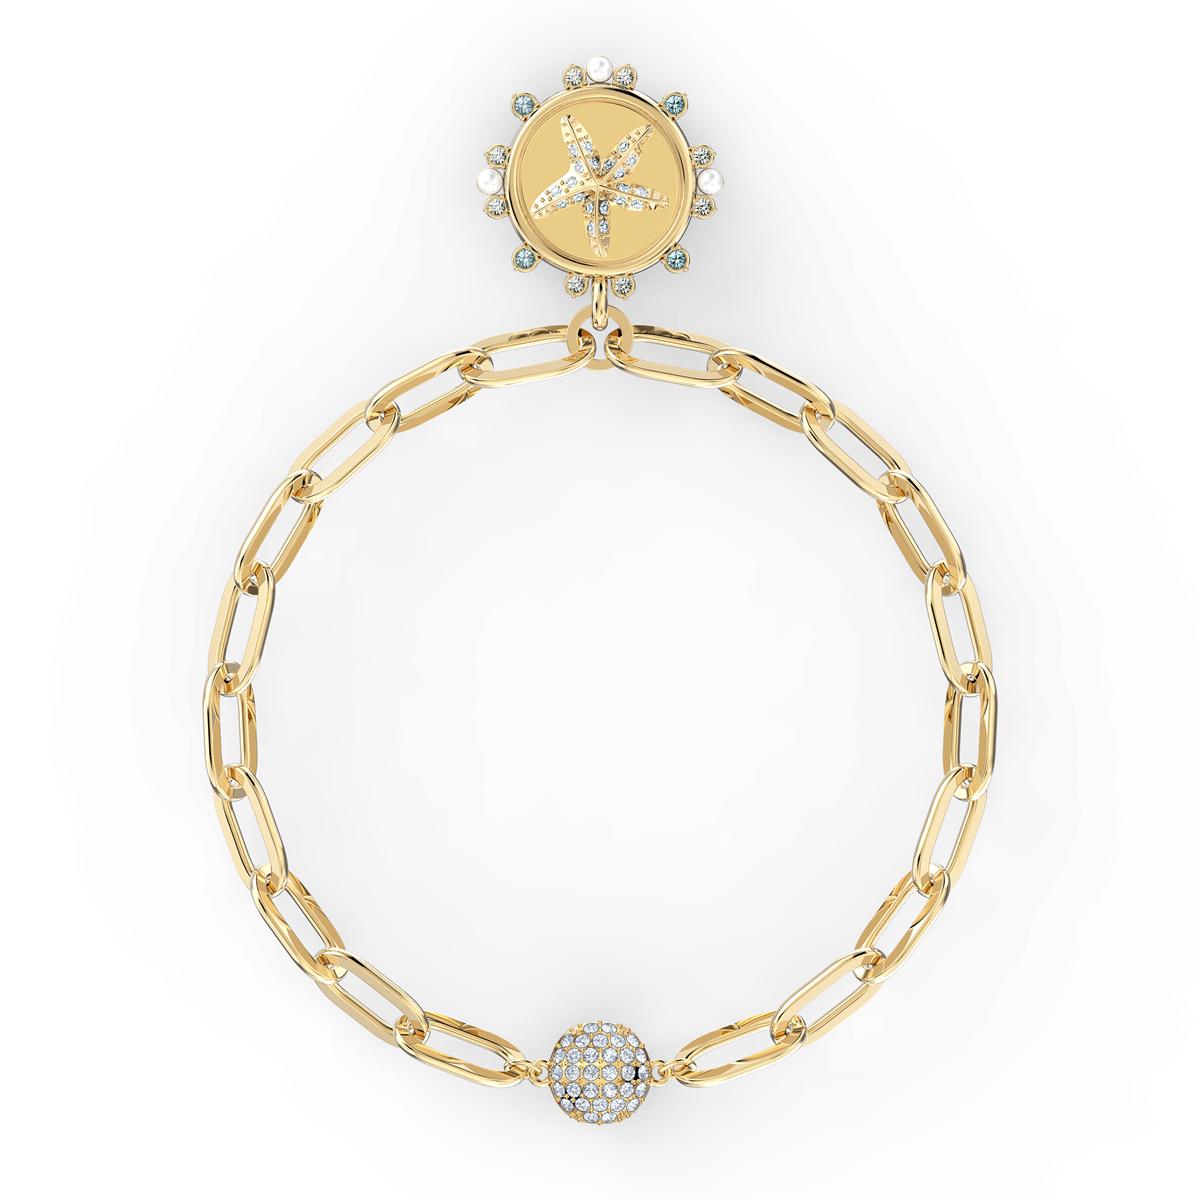 Swarovski The Elements Star Bracelet, White, Gold Tone Plated